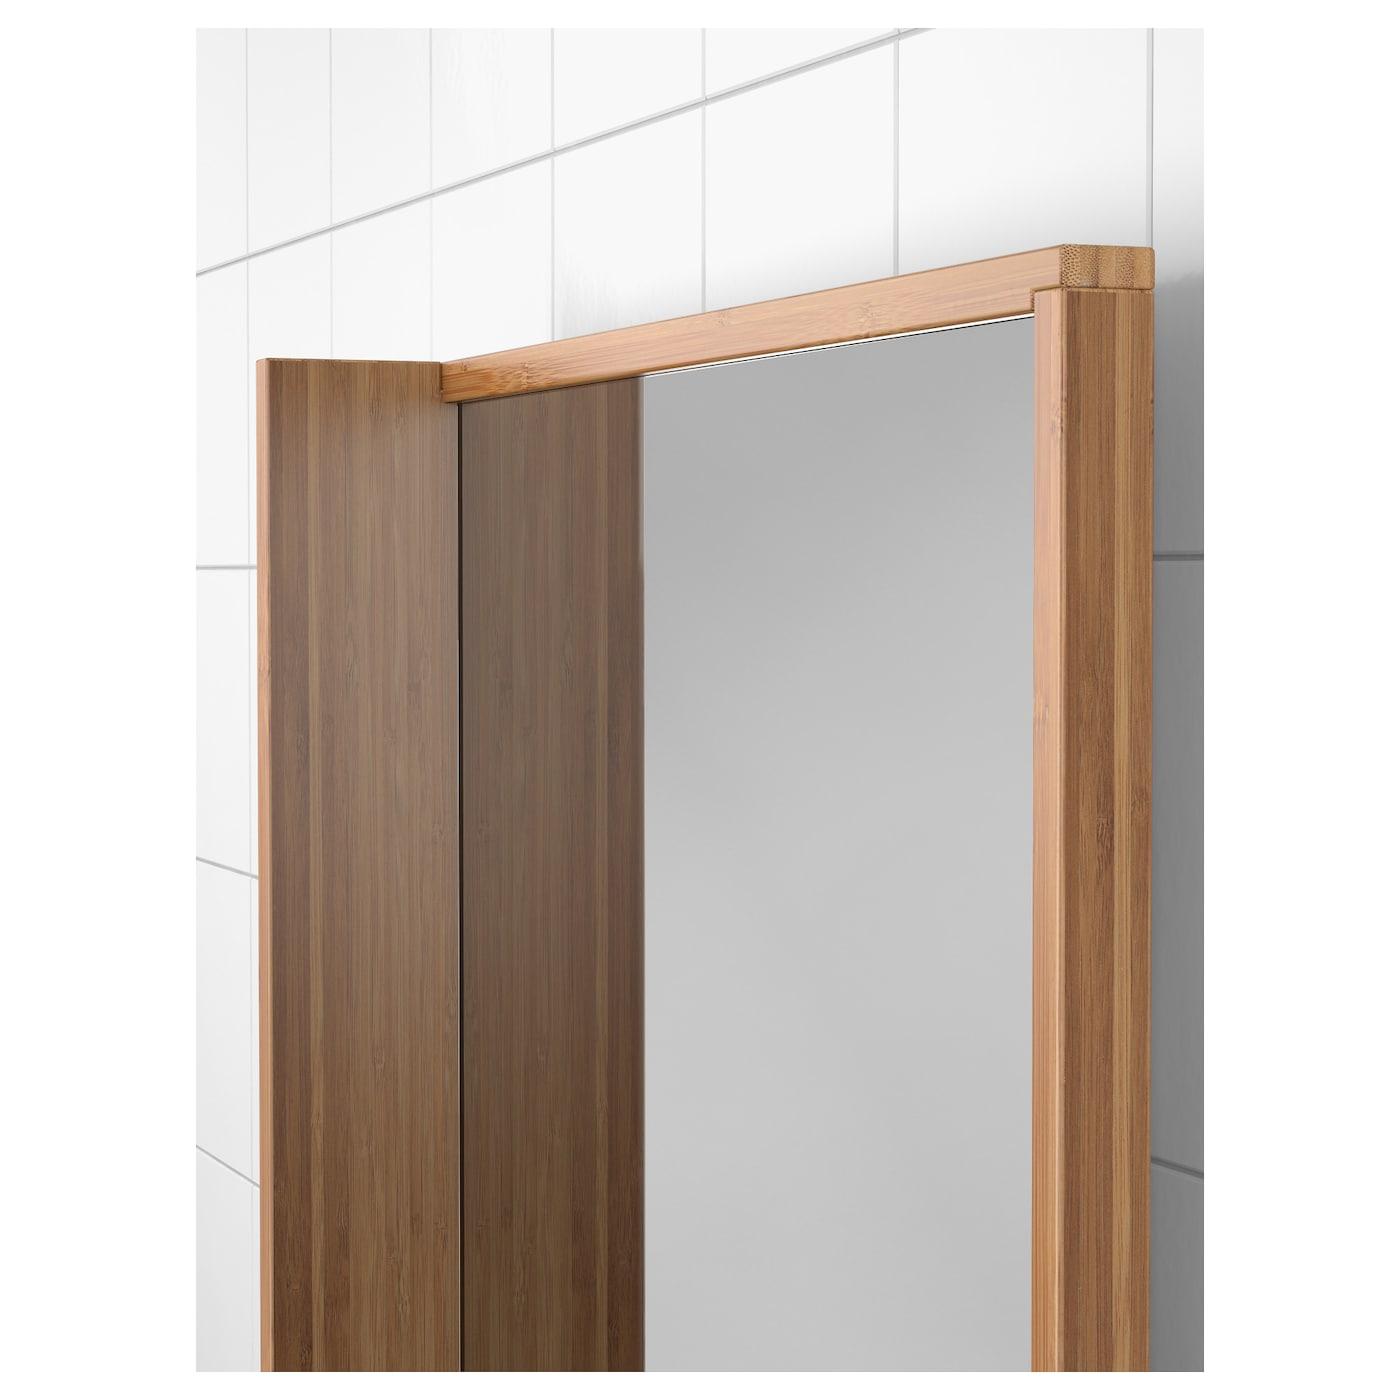 R grund miroir bambou 53x50 cm ikea for Miroir bambou